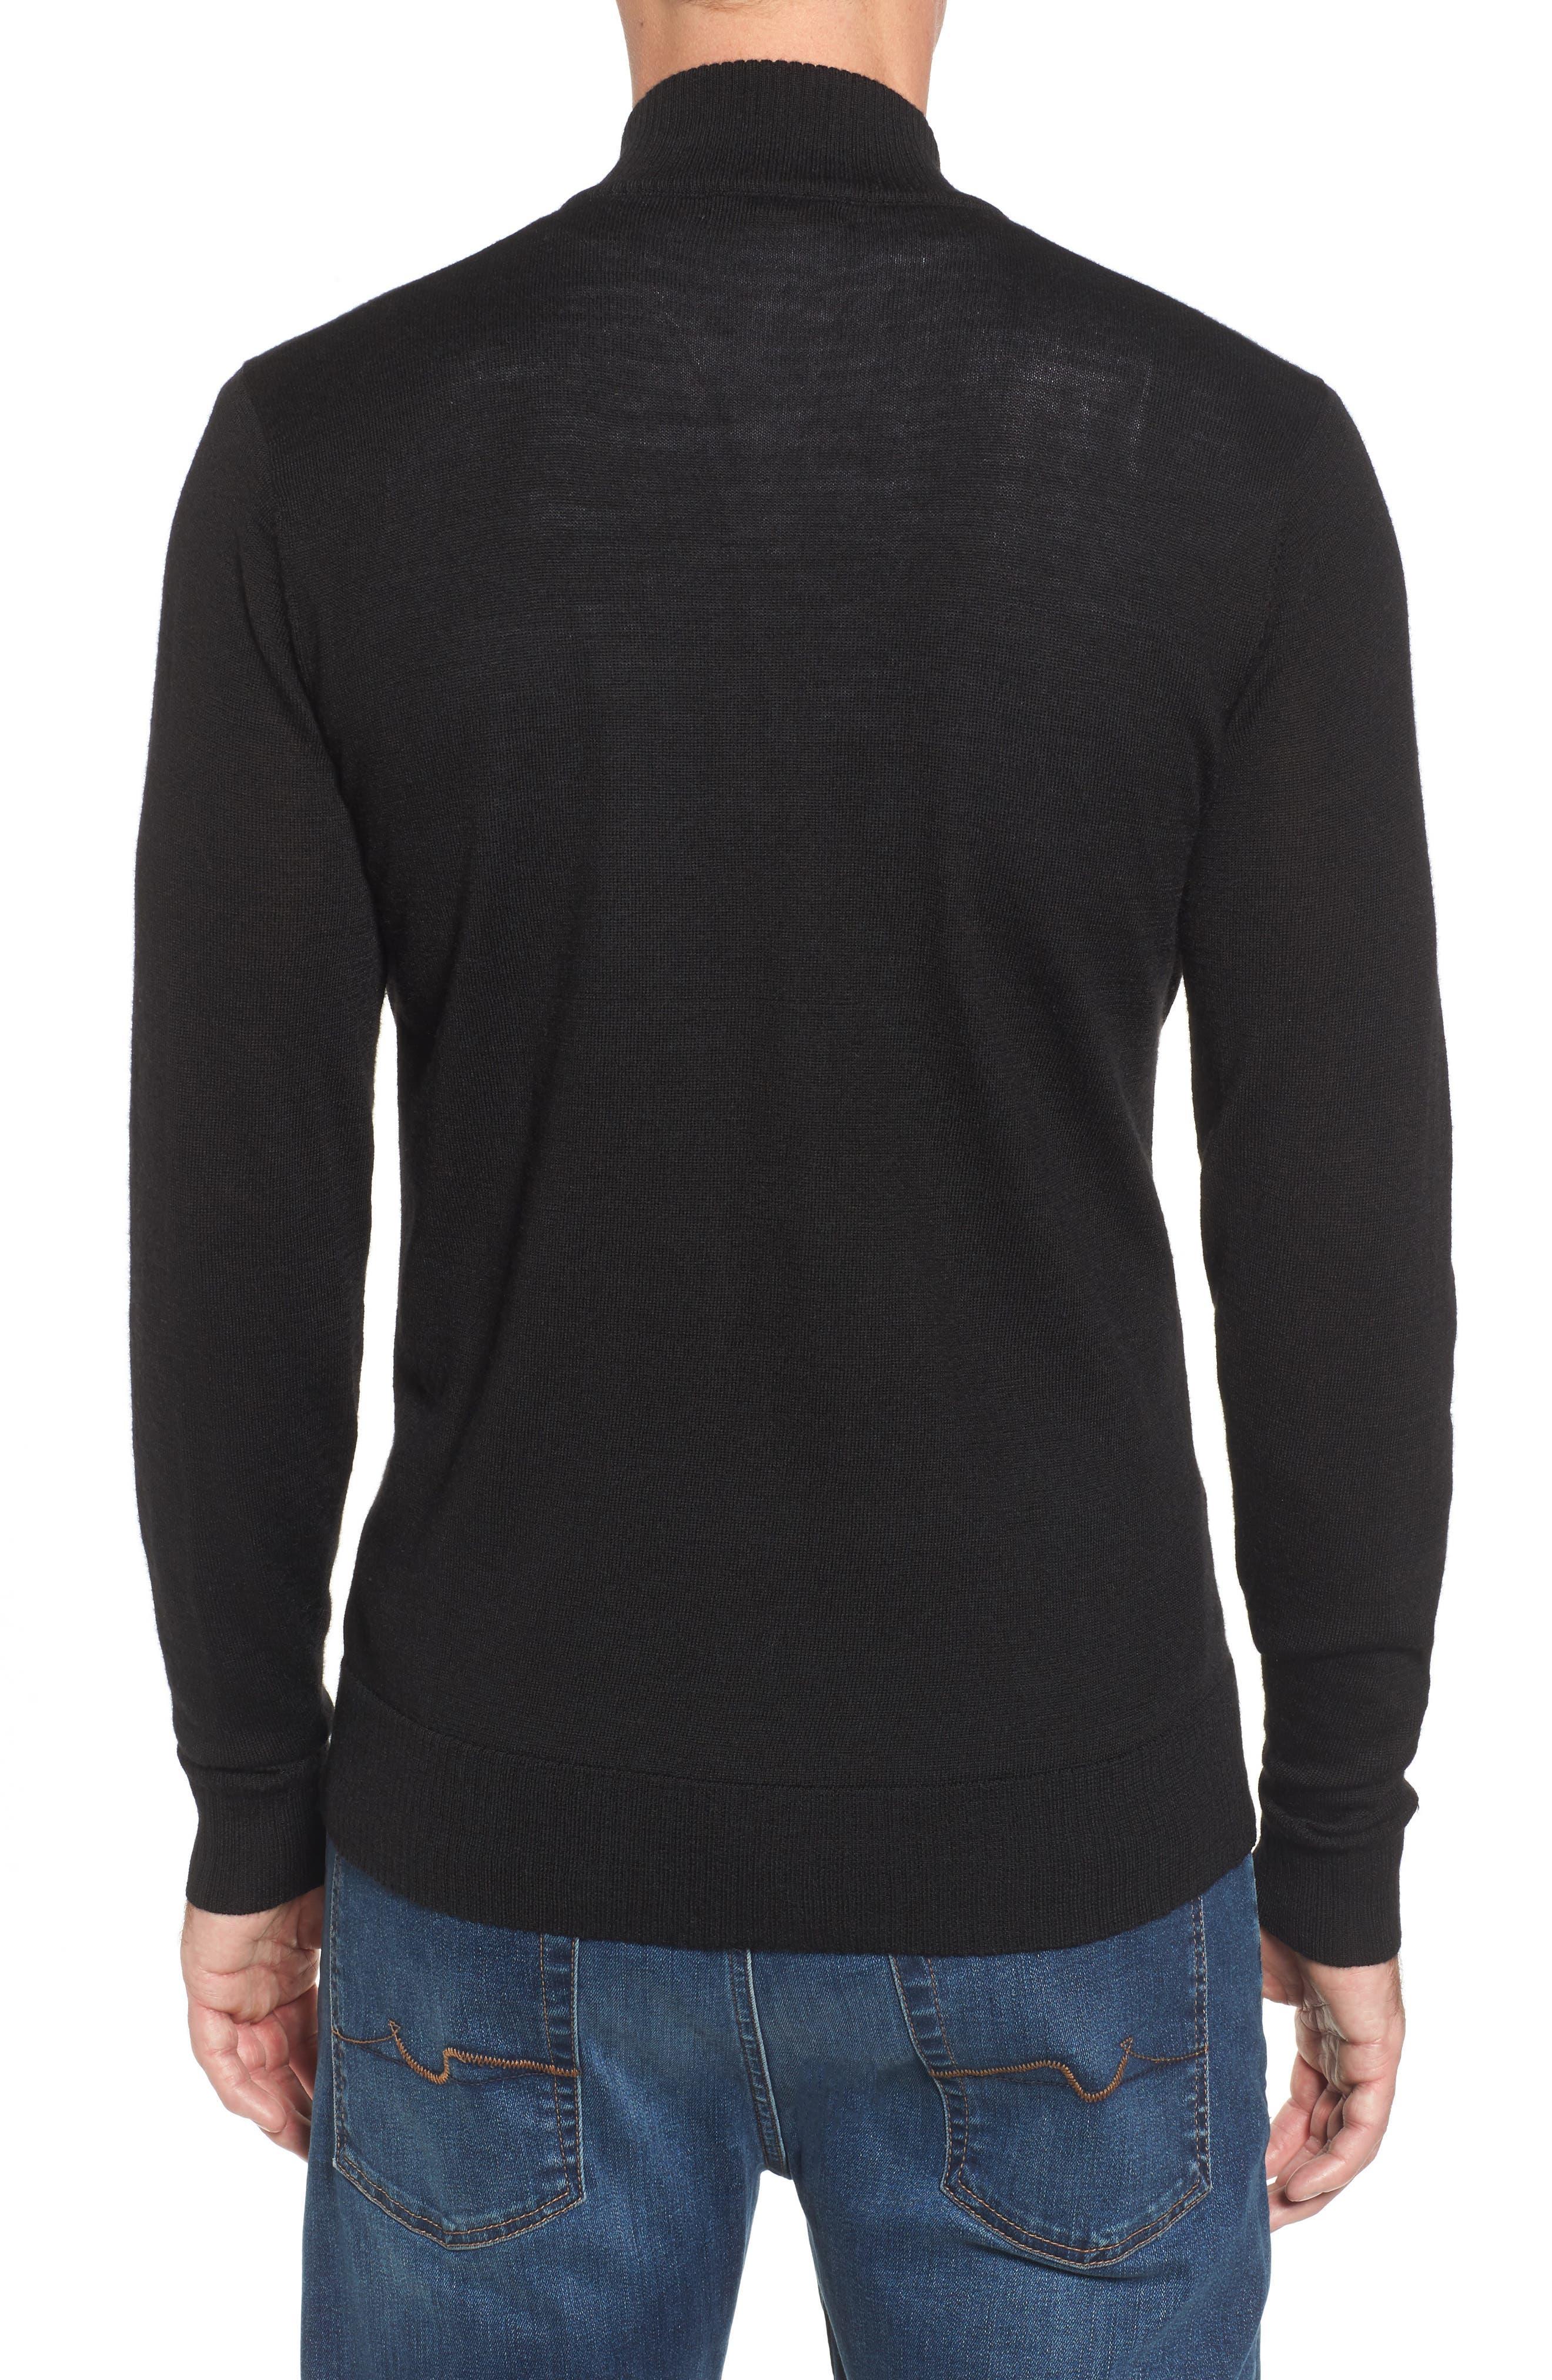 Kiva Ridge Merino Wool Blend Pullover,                             Alternate thumbnail 2, color,                             Black